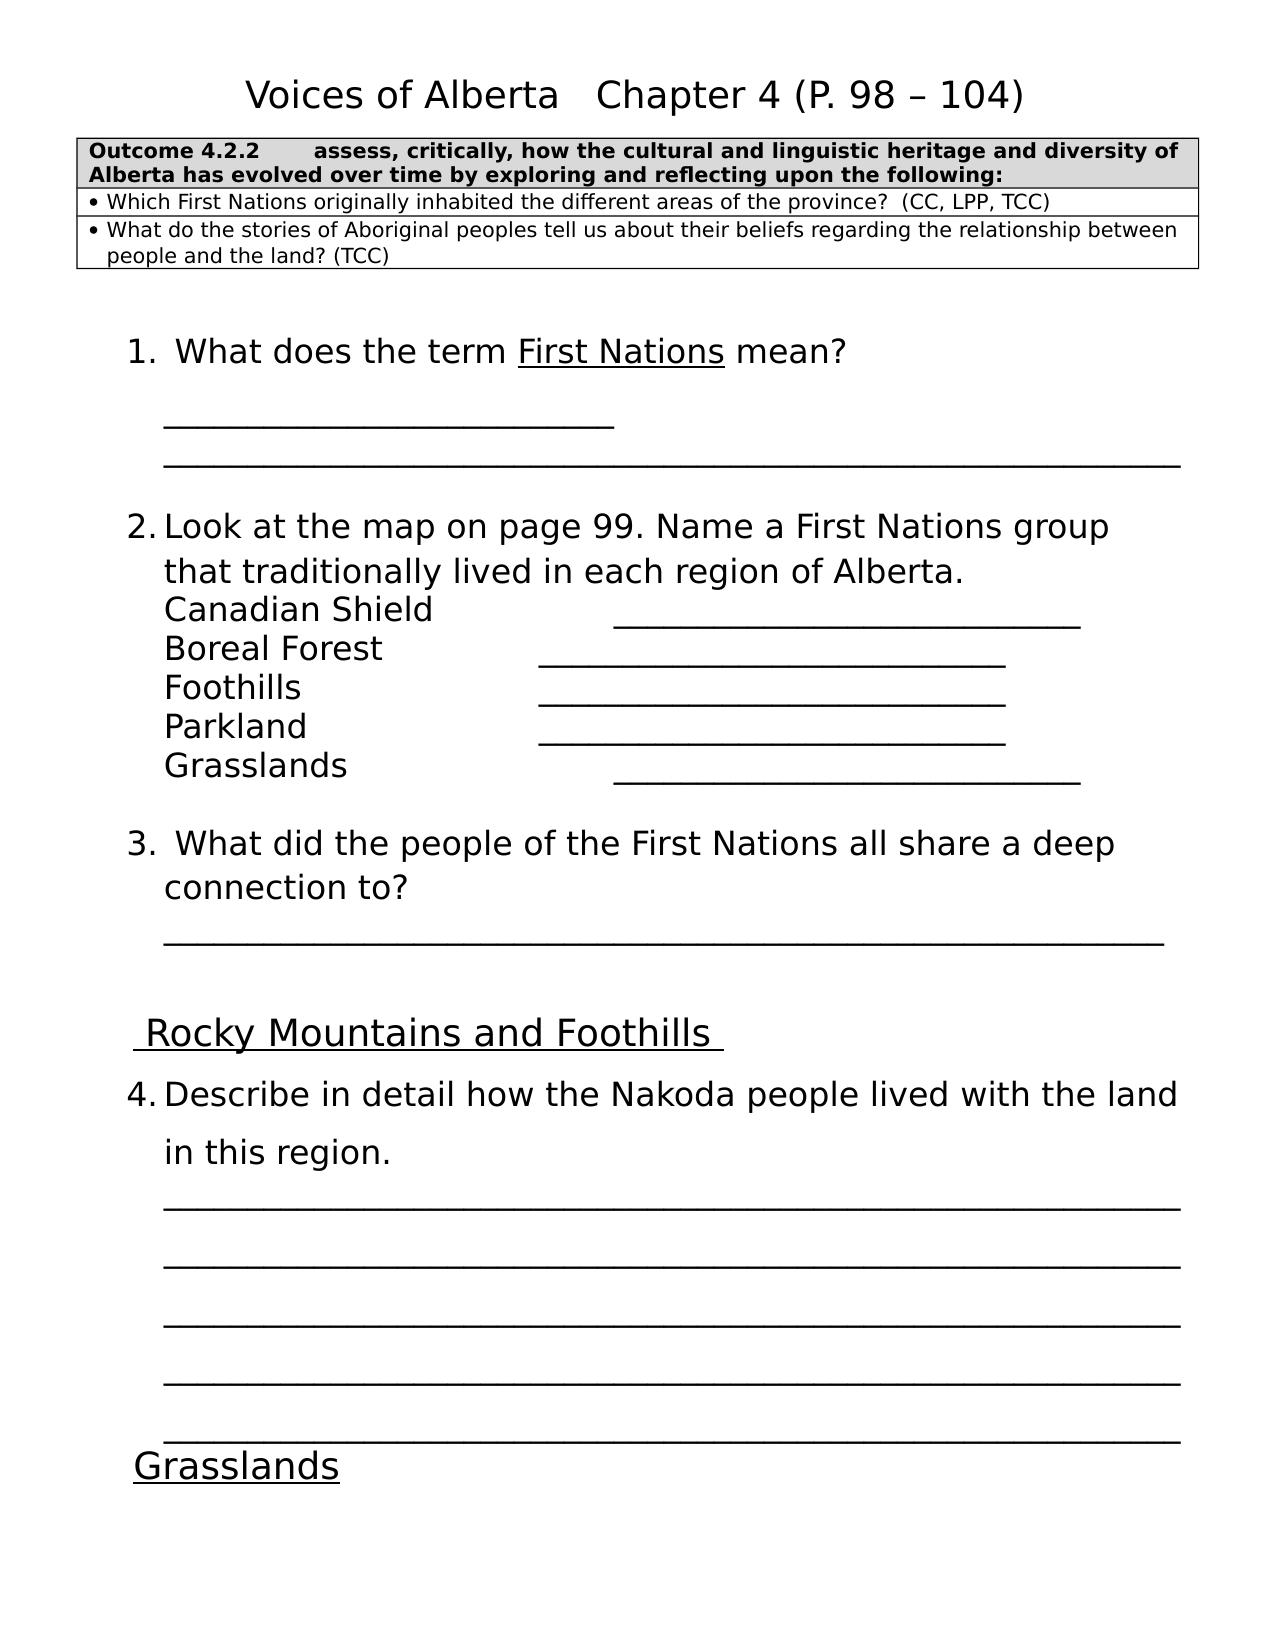 Browse Our Grade 4 Social Stu S Resources